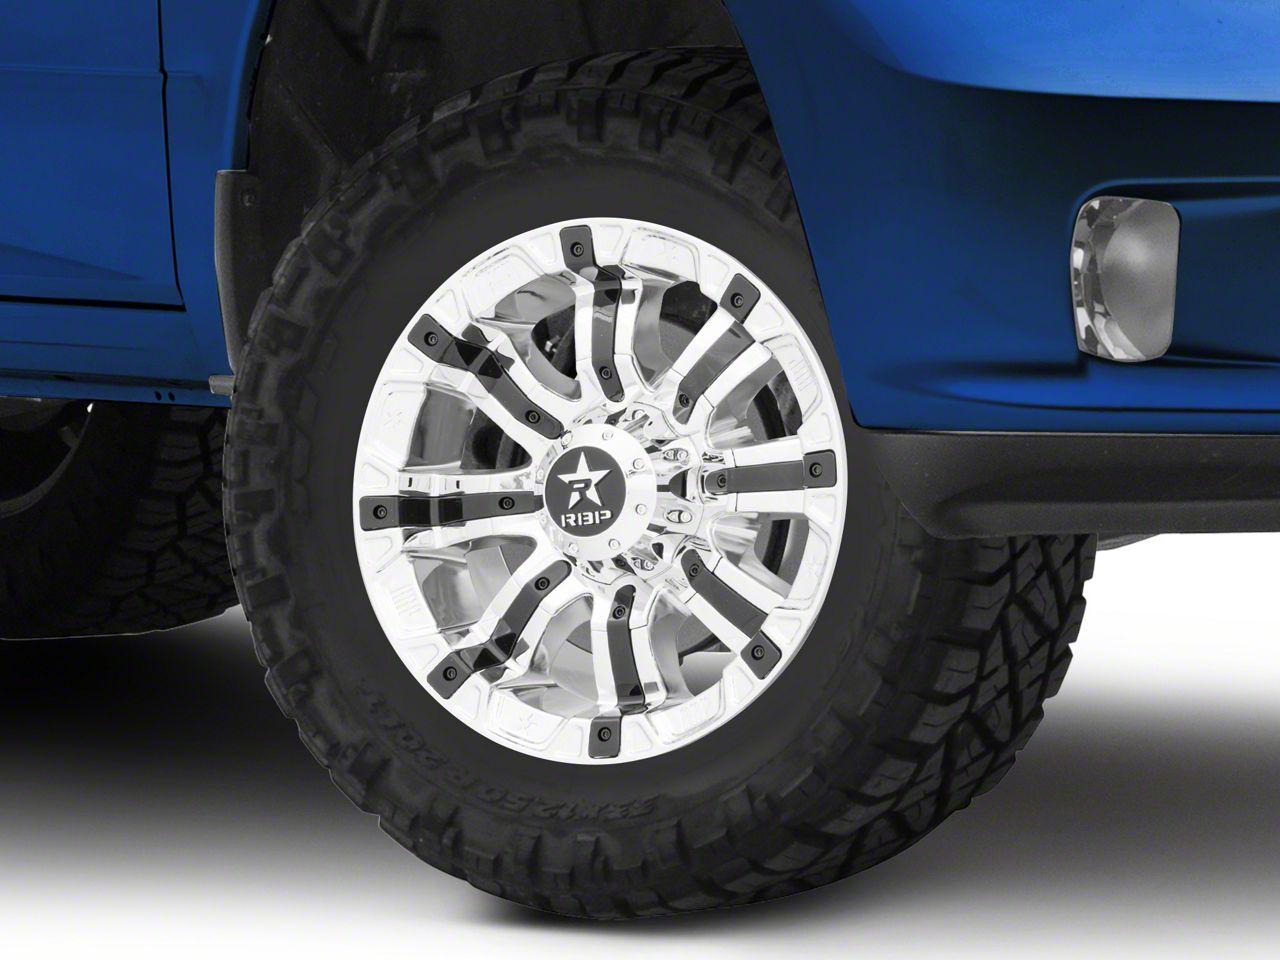 RBP 94R Chrome w/ Black Inserts 5-Lug Wheel - 17x9 (02-18 RAM 1500, Excluding Mega Cab)